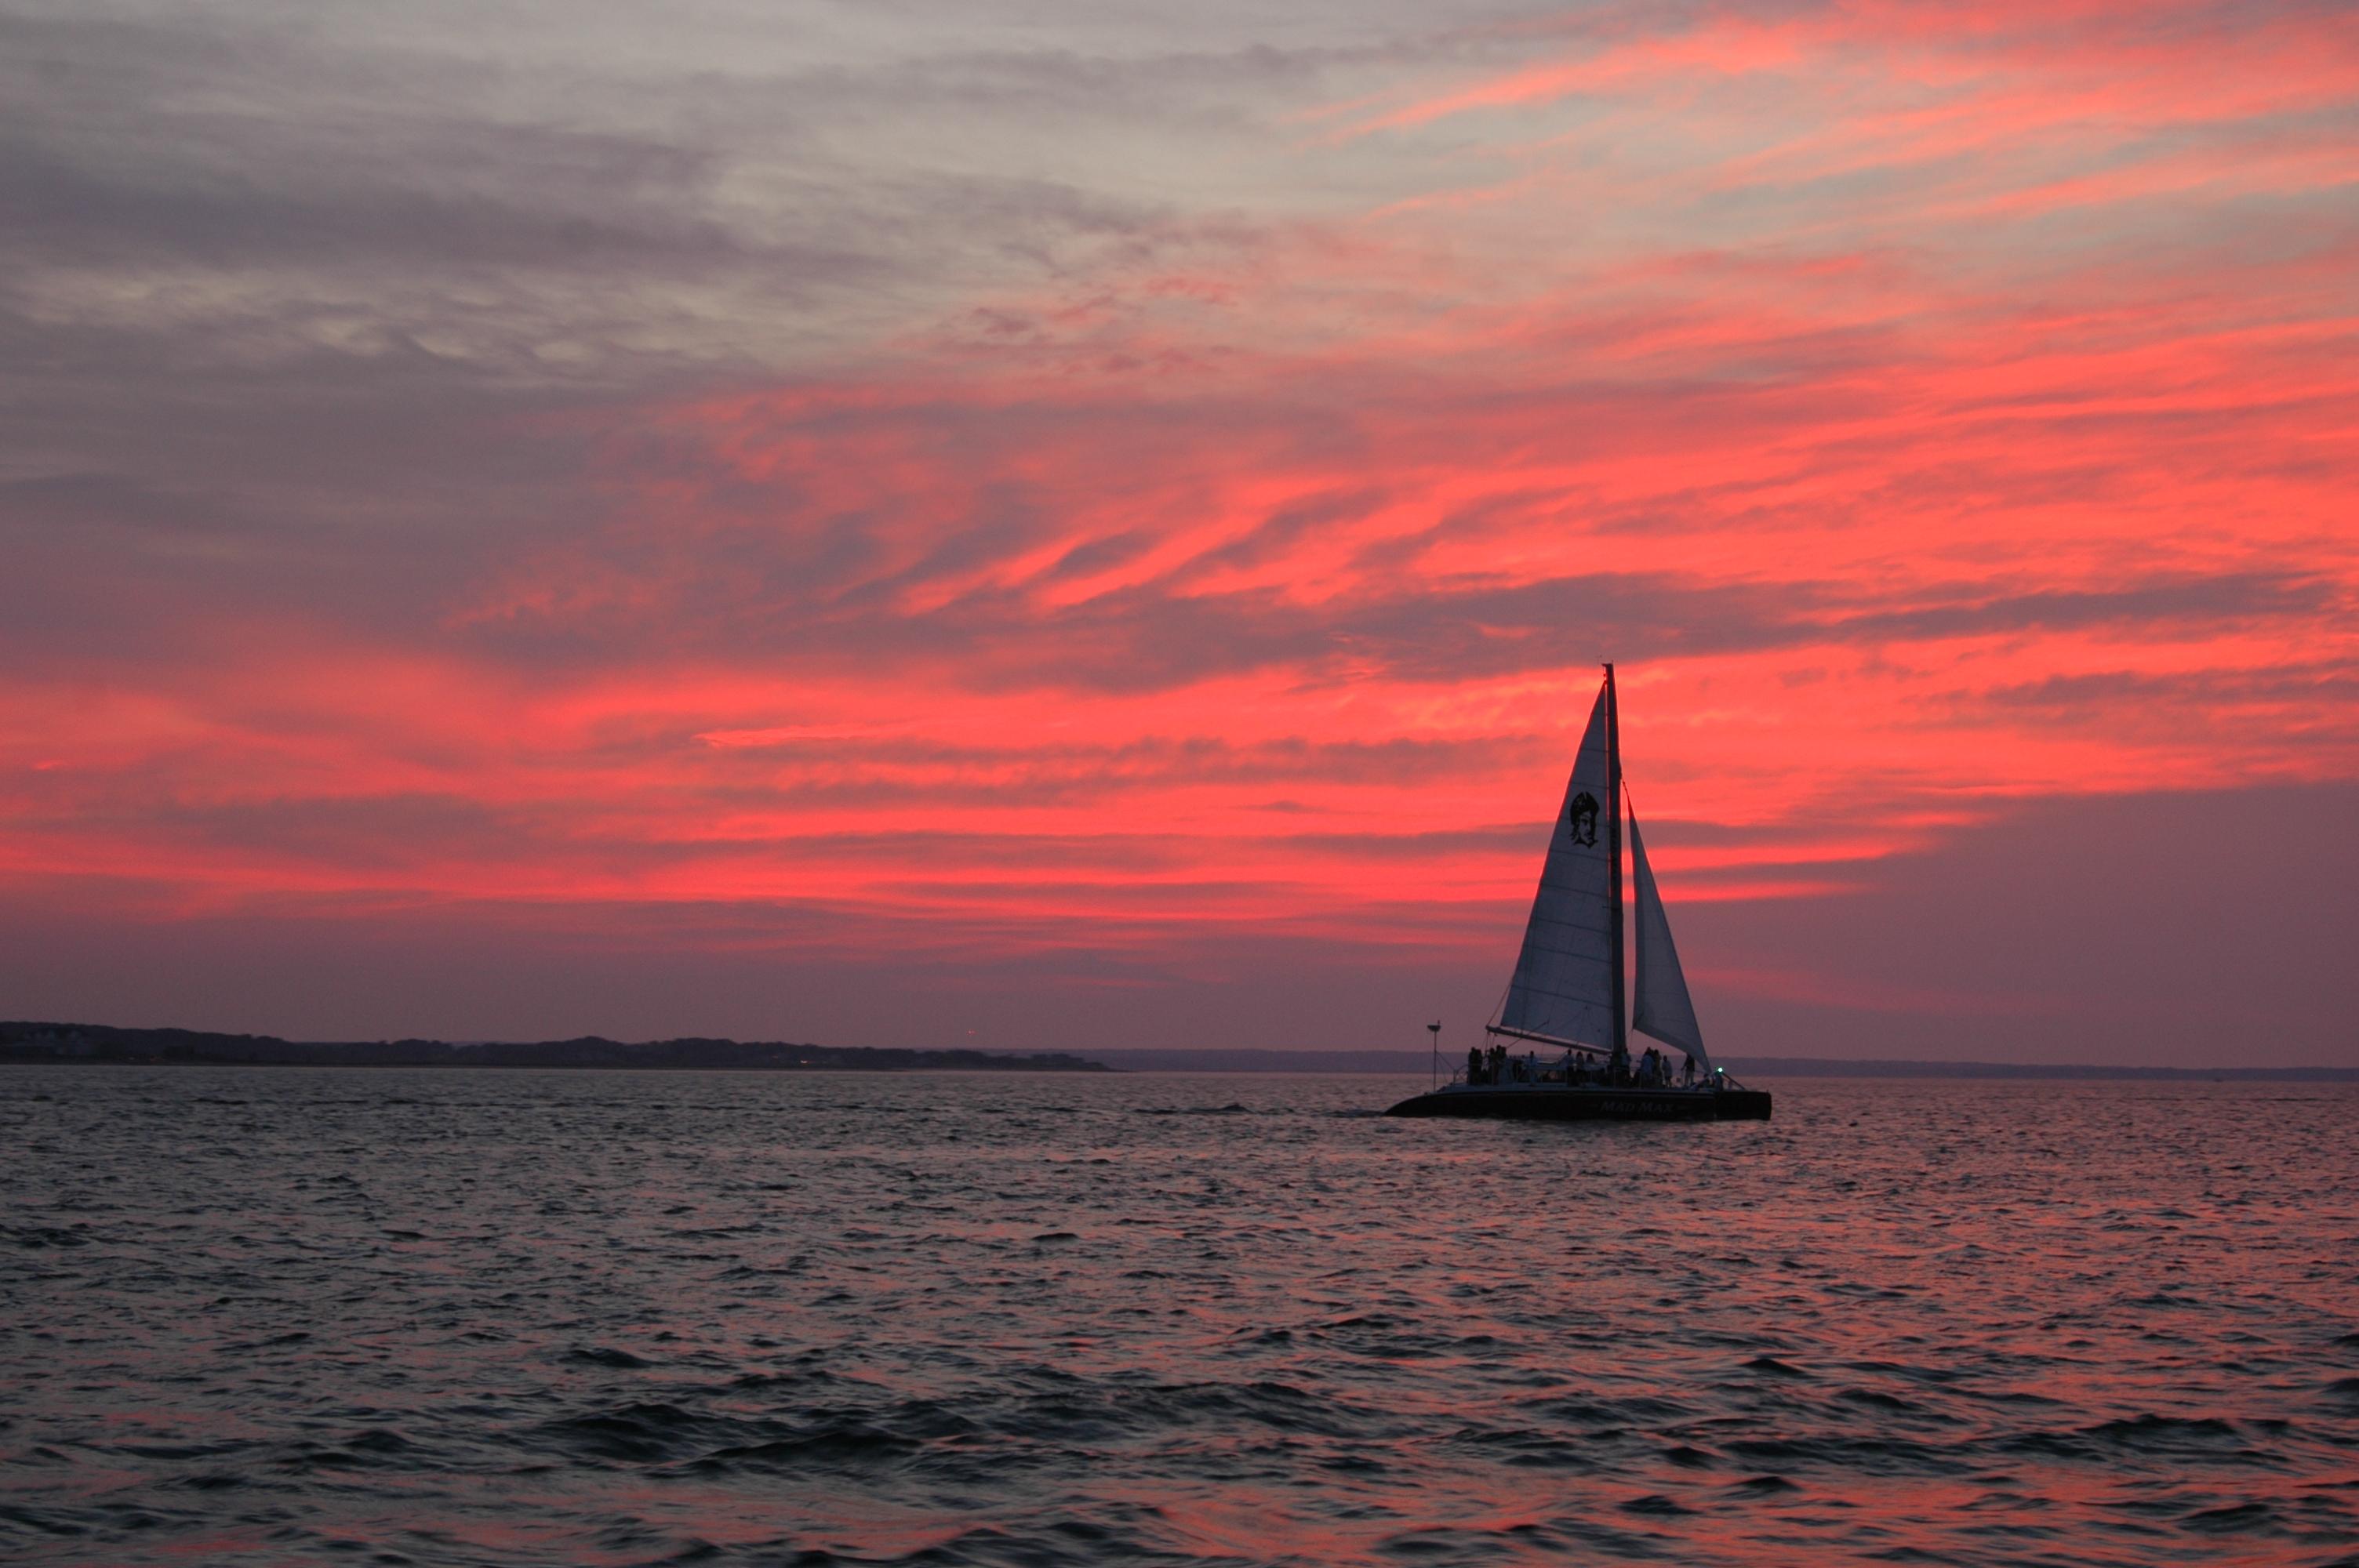 sunset sailing boats rocks - photo #8